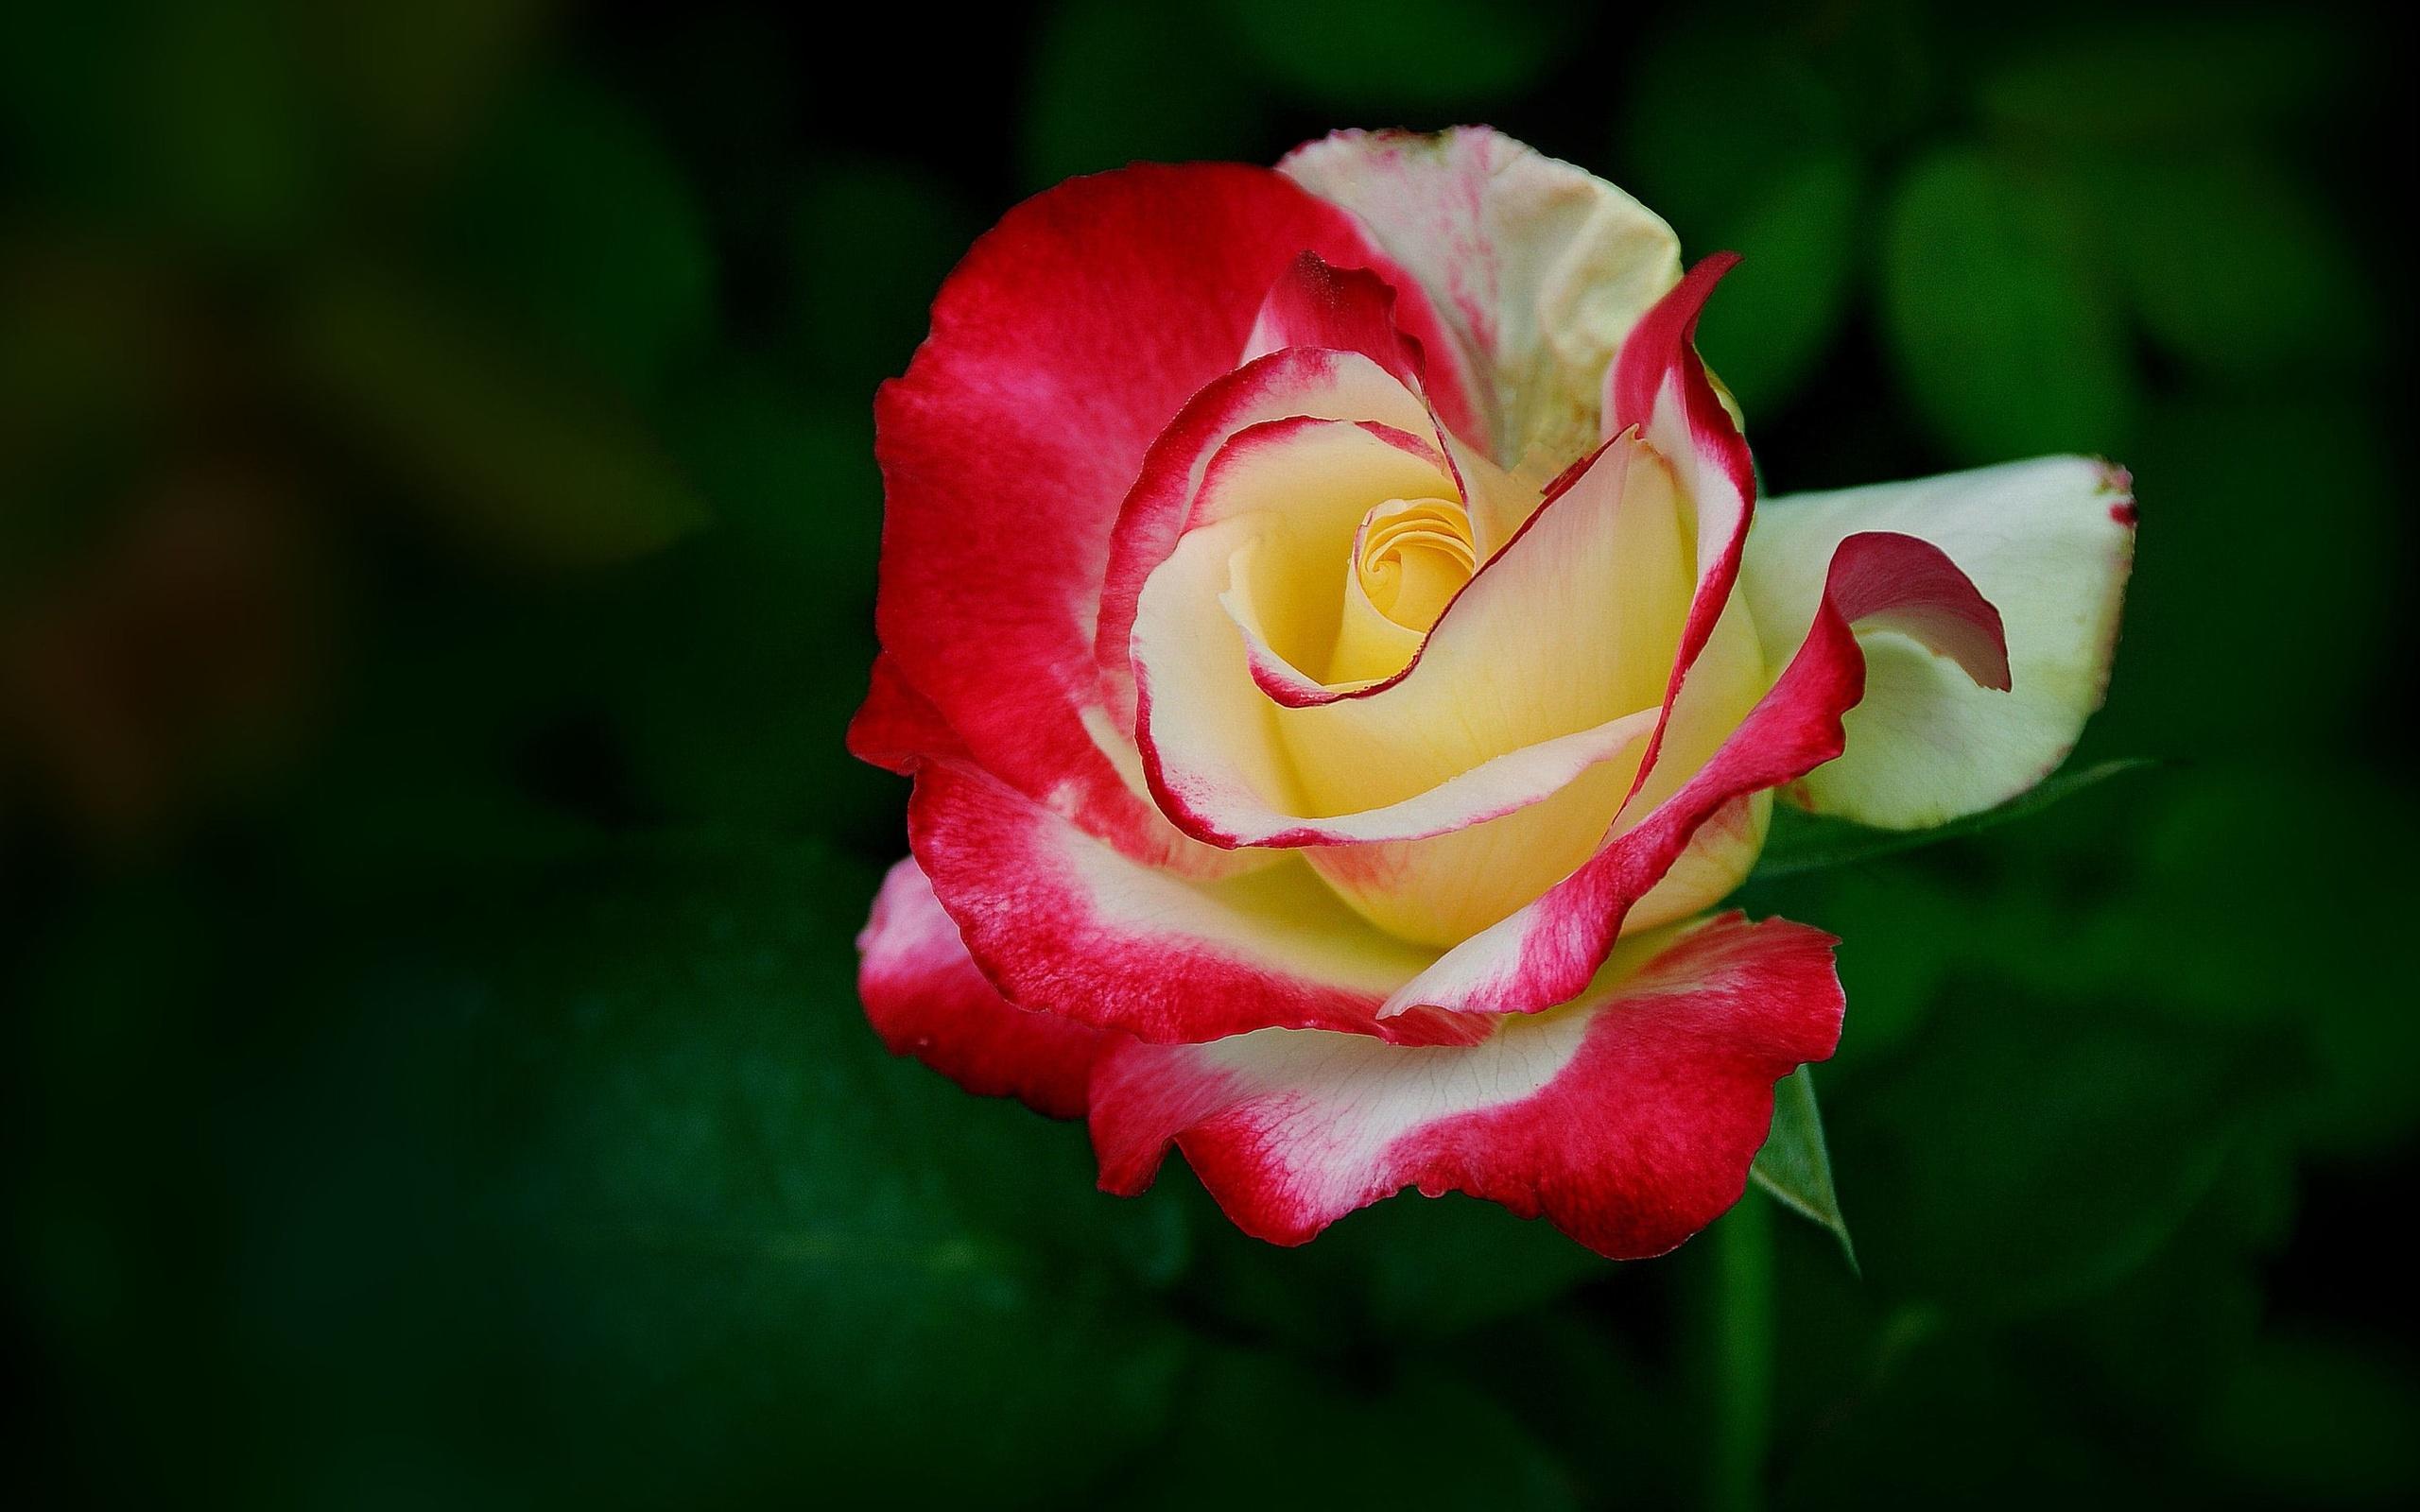 Rose hd wallpaper background image 2560x1600 id - Big rose flower wallpaper ...